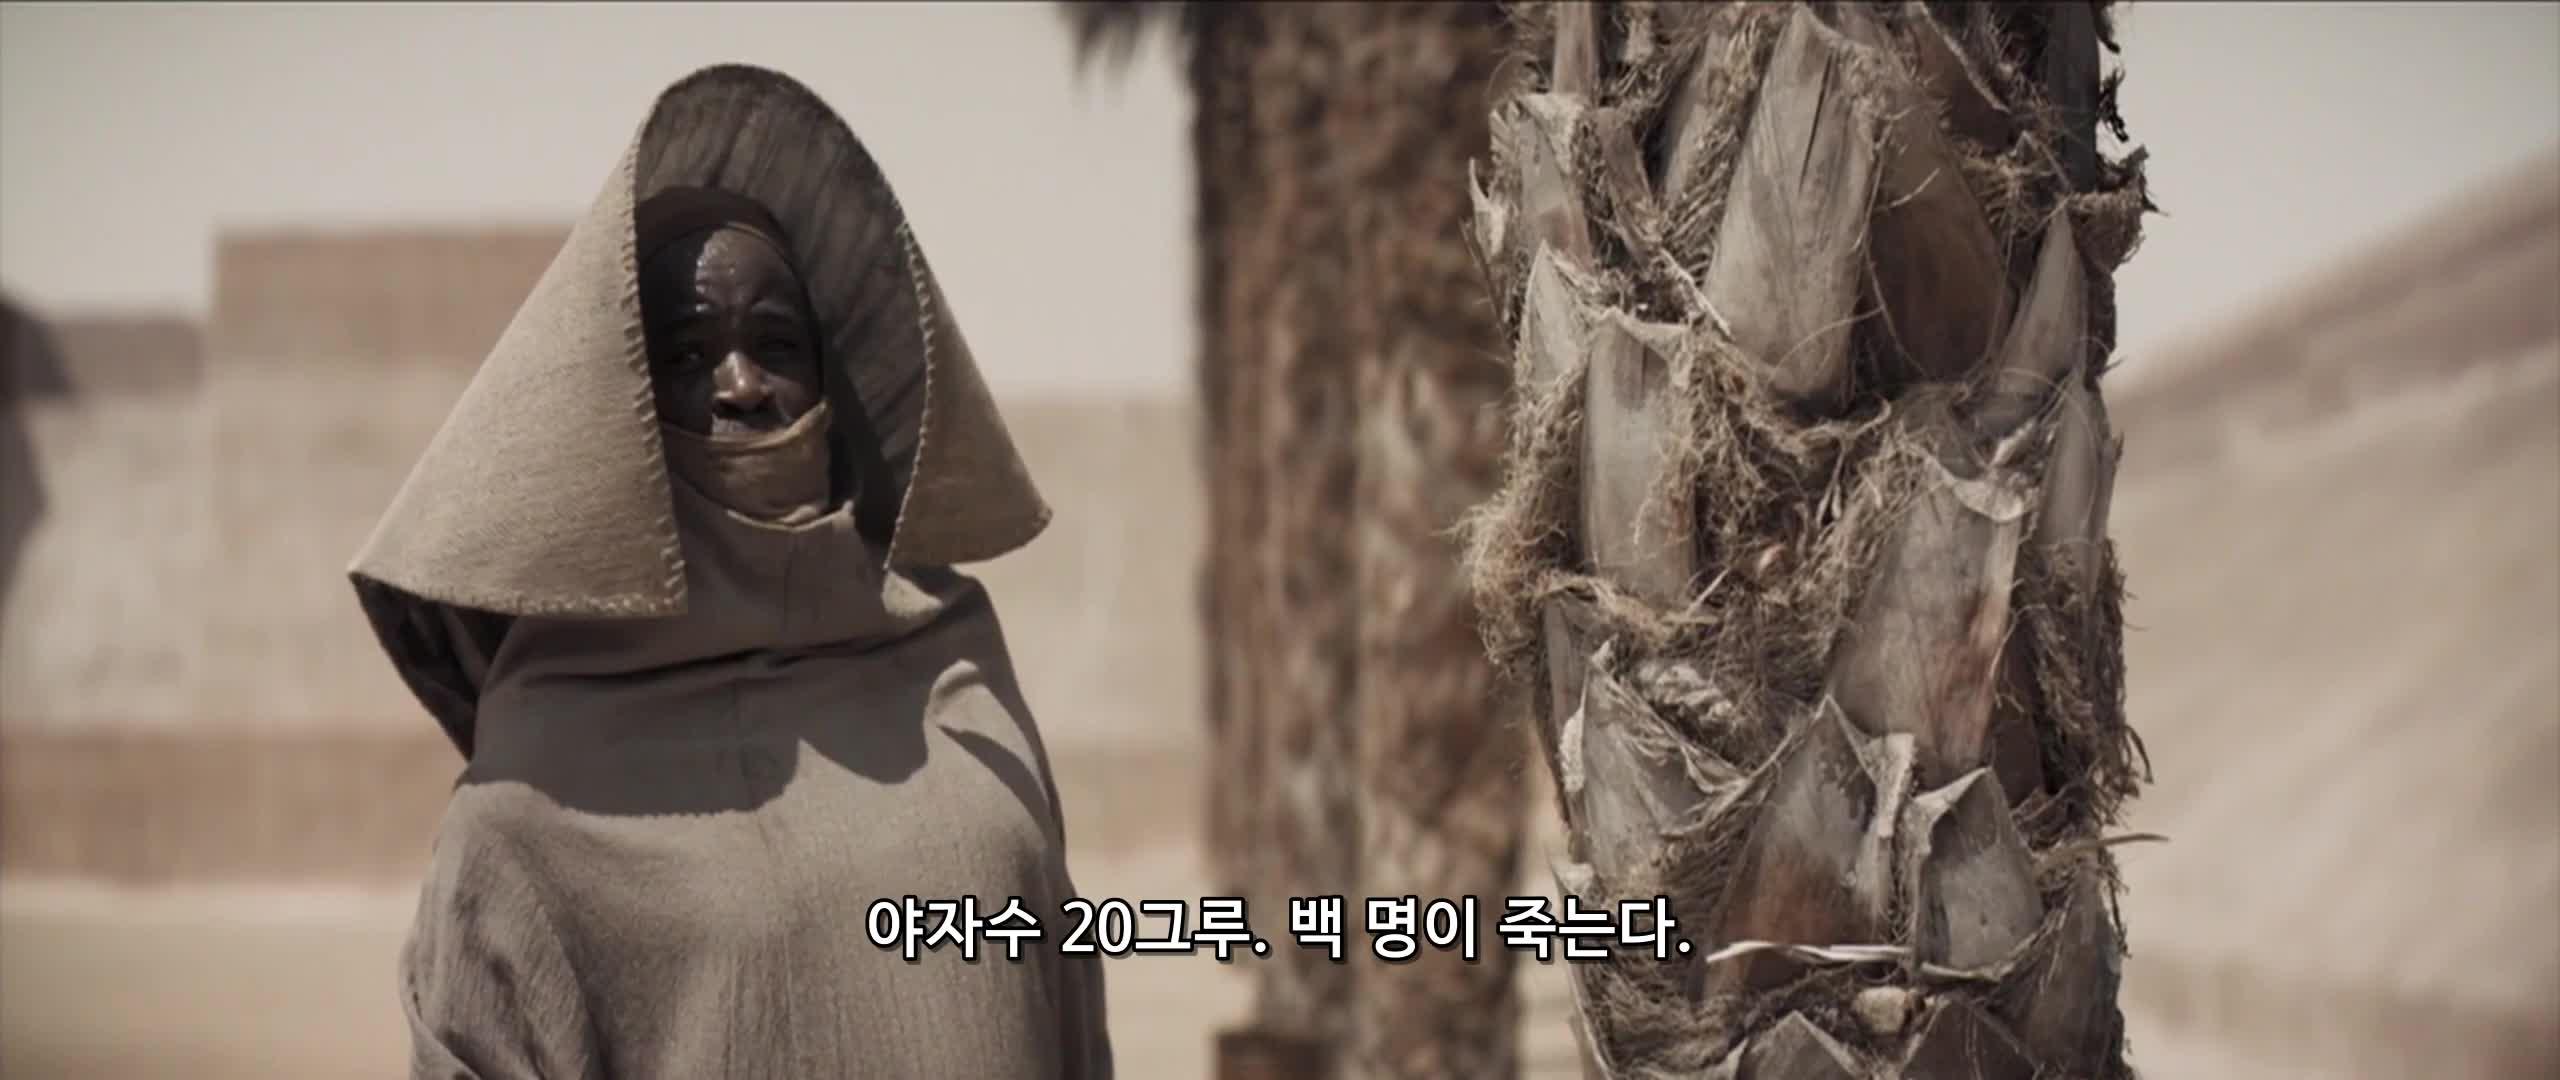 1O월2O일 개봉 SF신작 [[  왕  으l  귀  환  ]] FHD 한글완벽자막